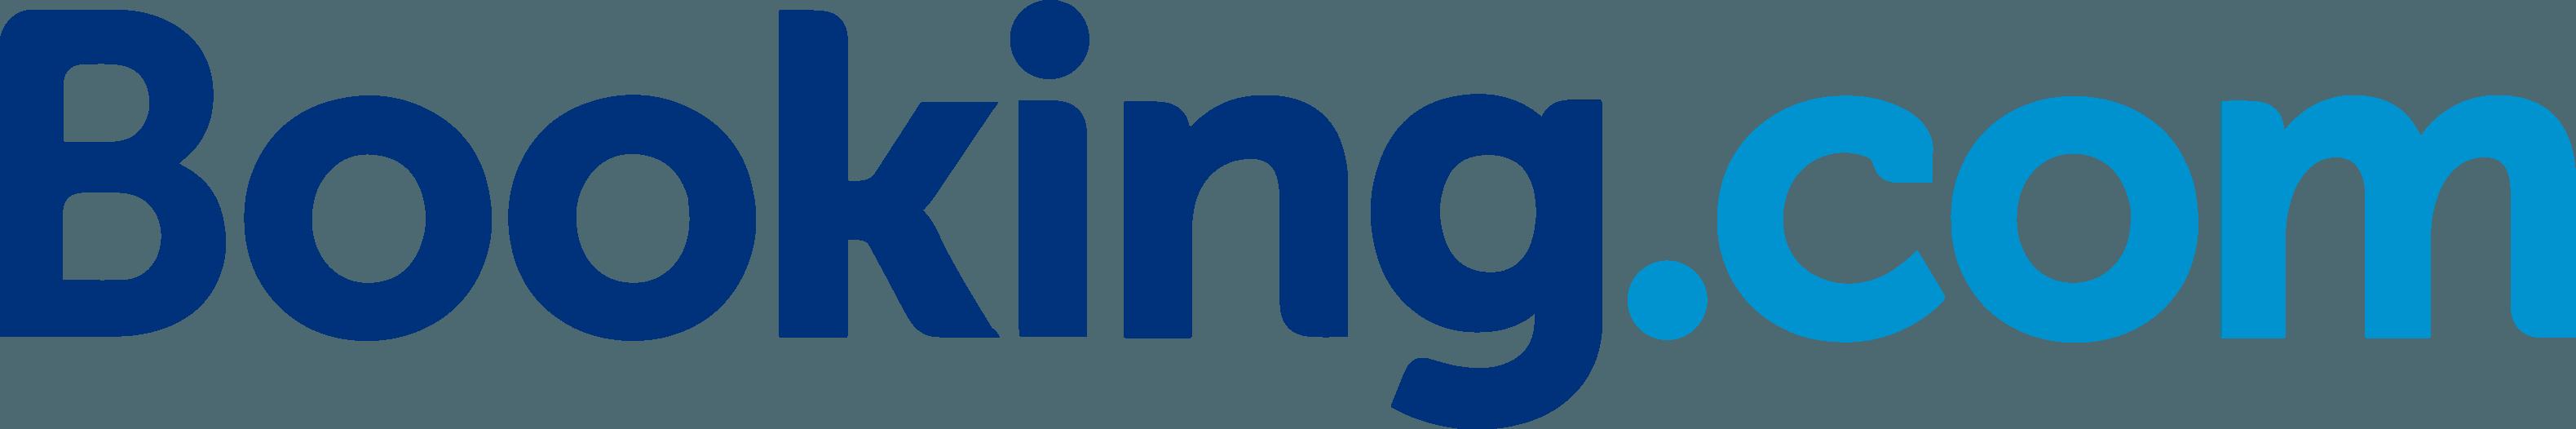 Booking.com Logo png